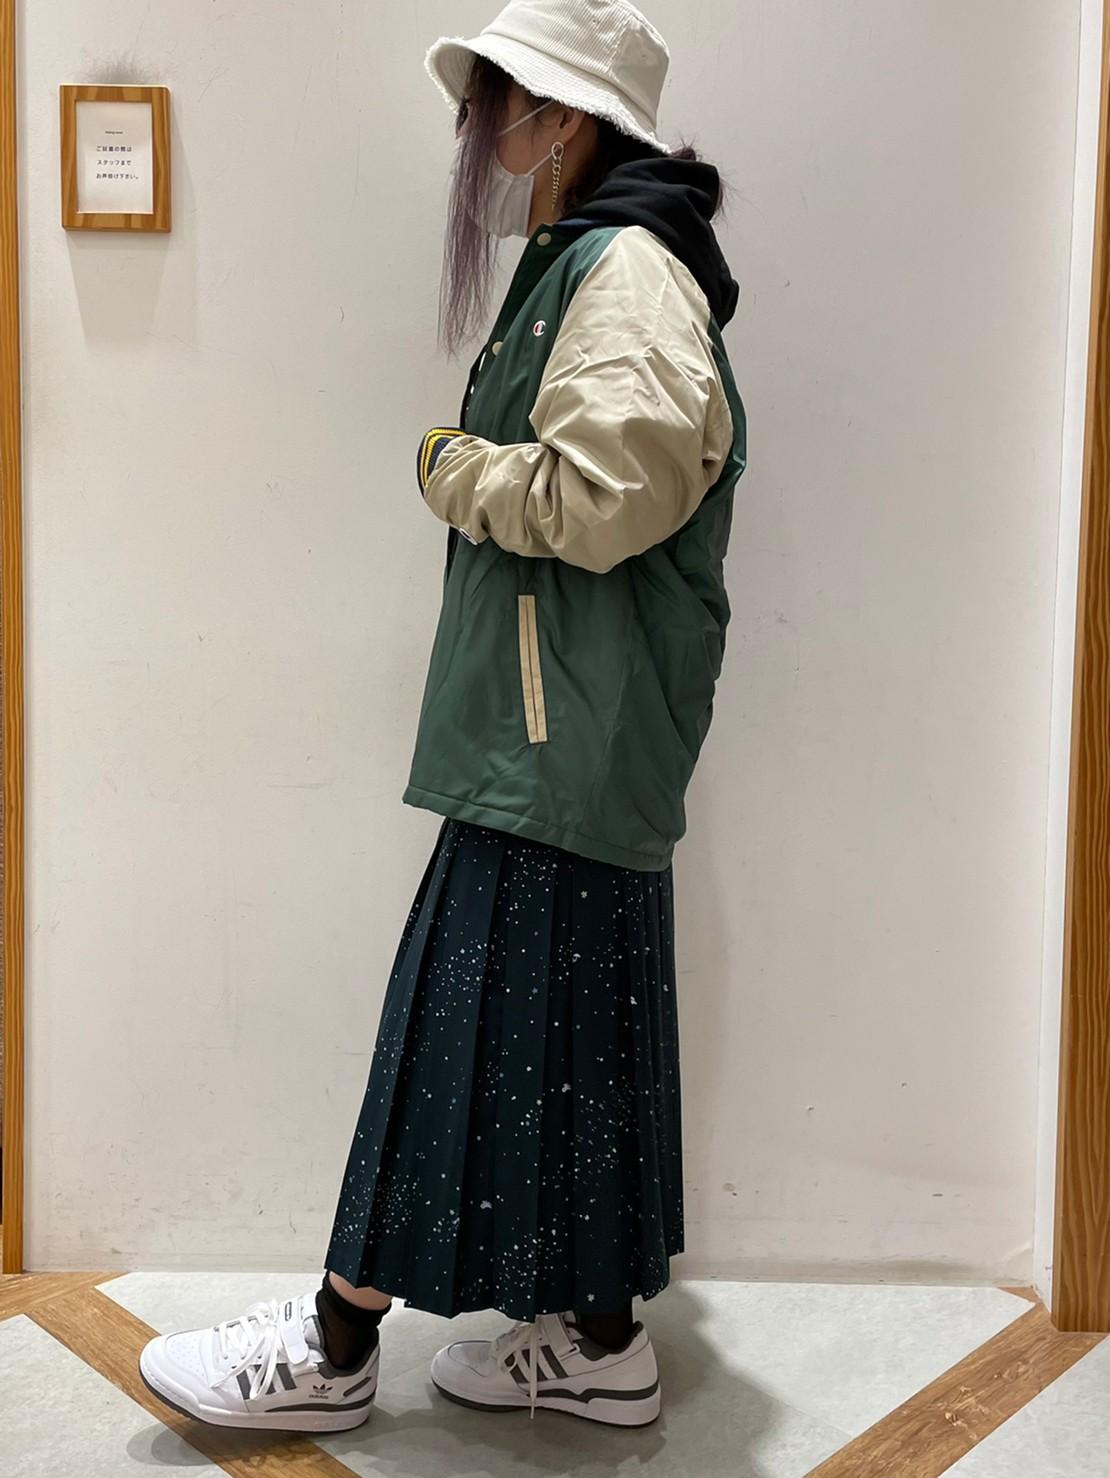 LINE_ALBUM_10.15あみブログ_211013_13